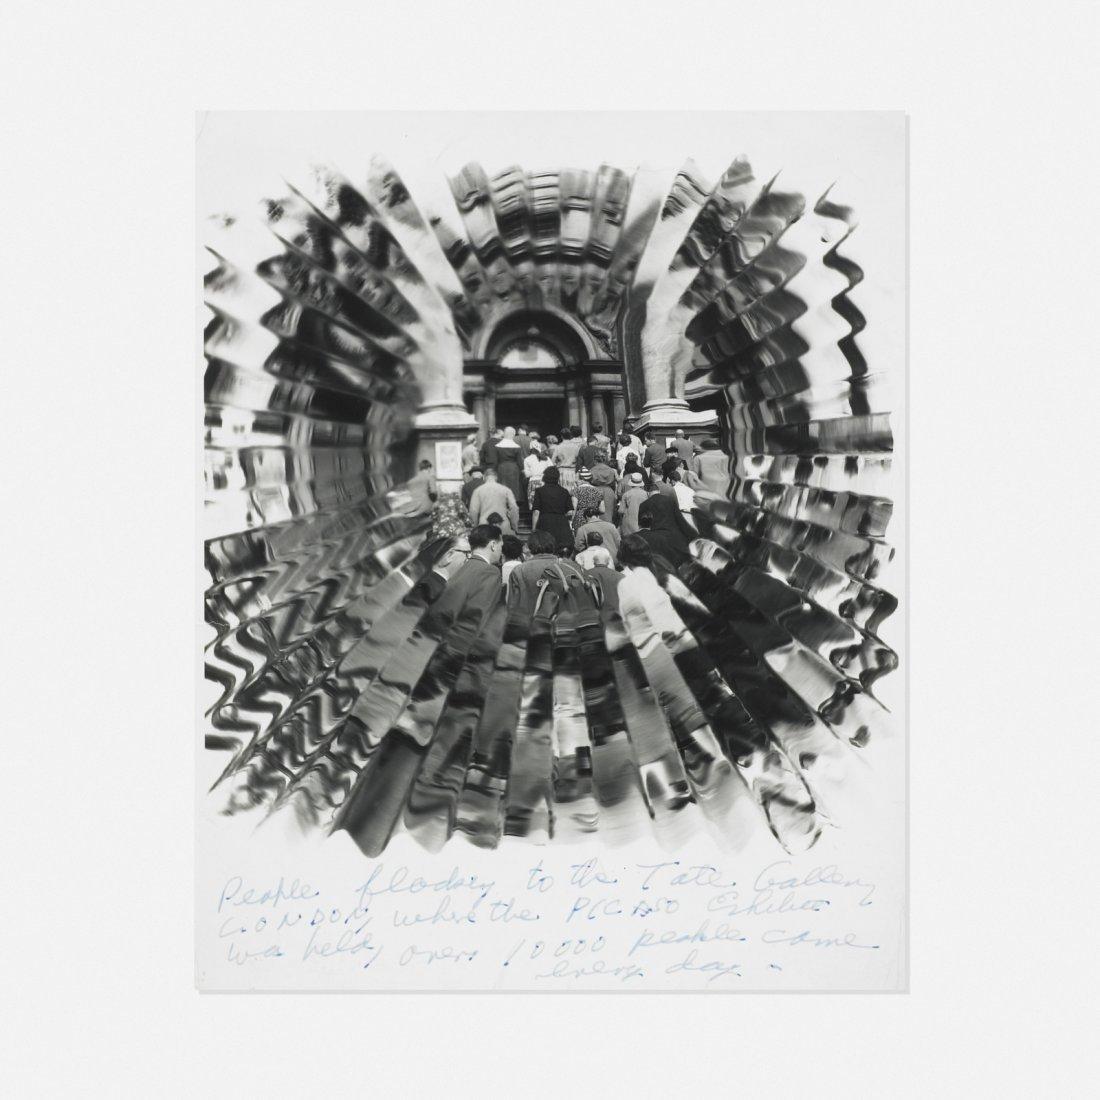 Weegee, Tate Gallery